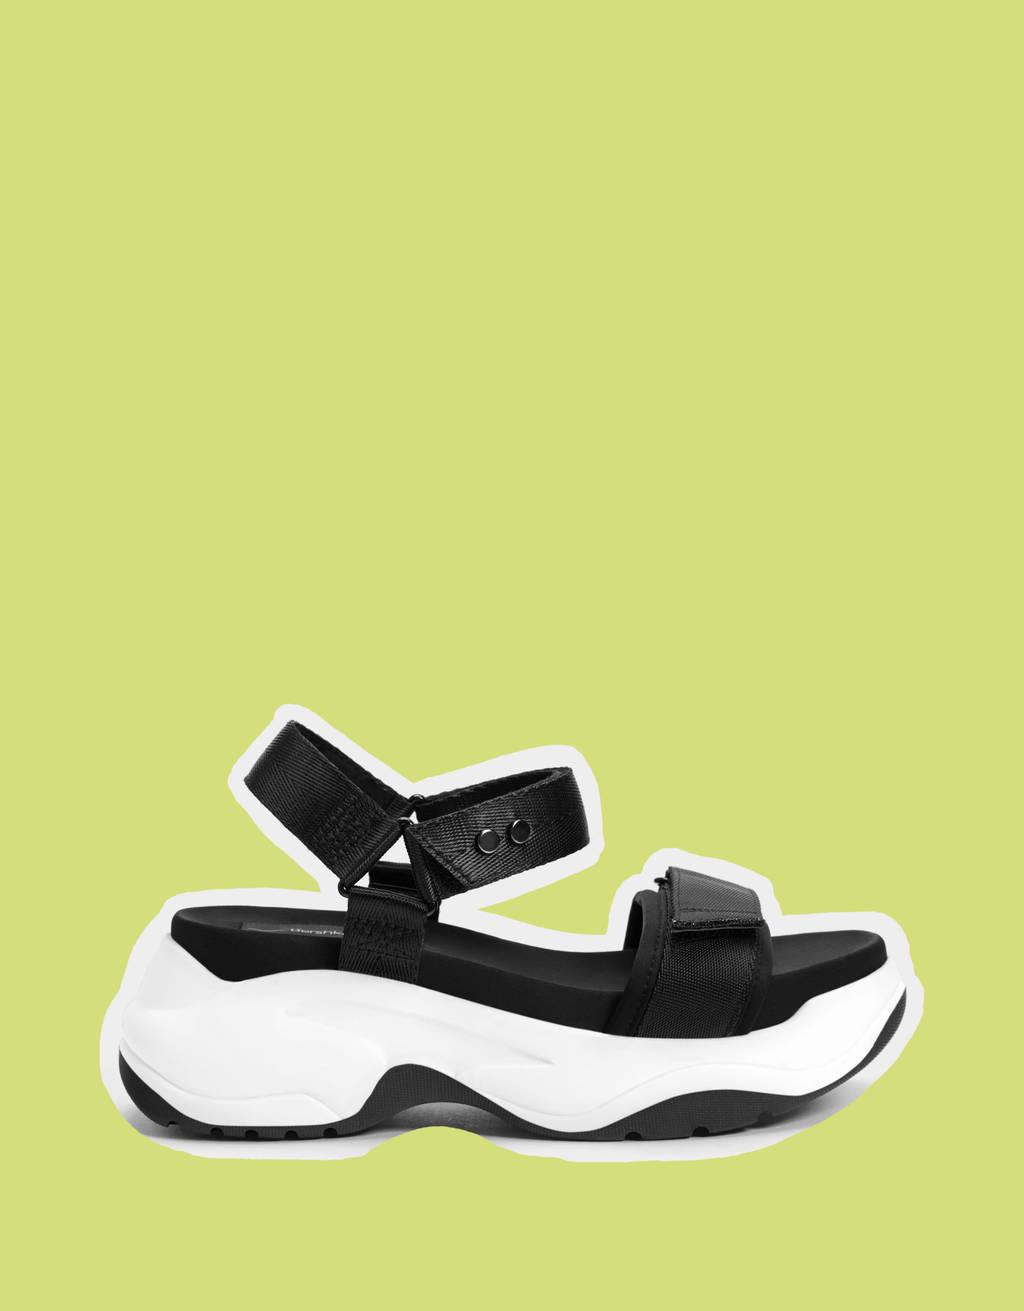 Sandales sport tissu plateforme